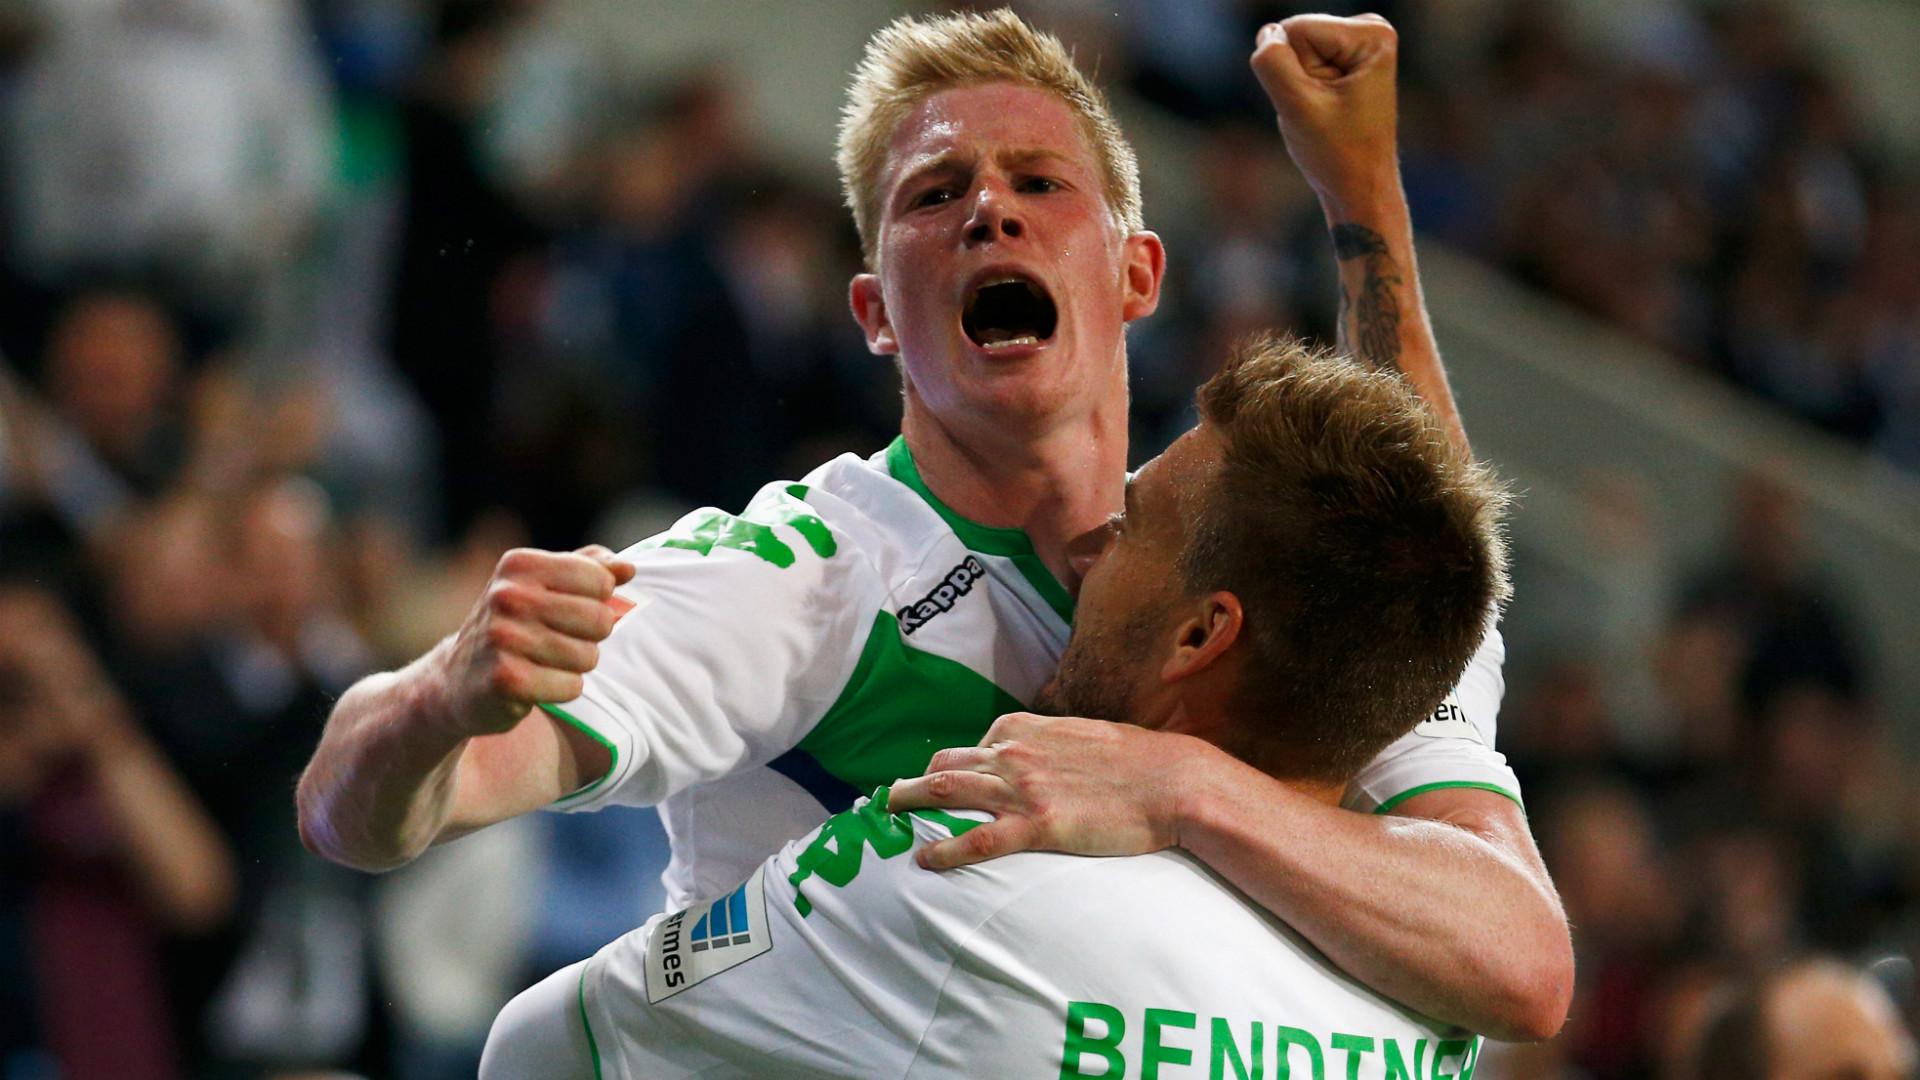 Nicklas Bendtner Kevin De Bruyne VfL Wolfsburg FC Bayern Munchen DFL Supercup 01082015